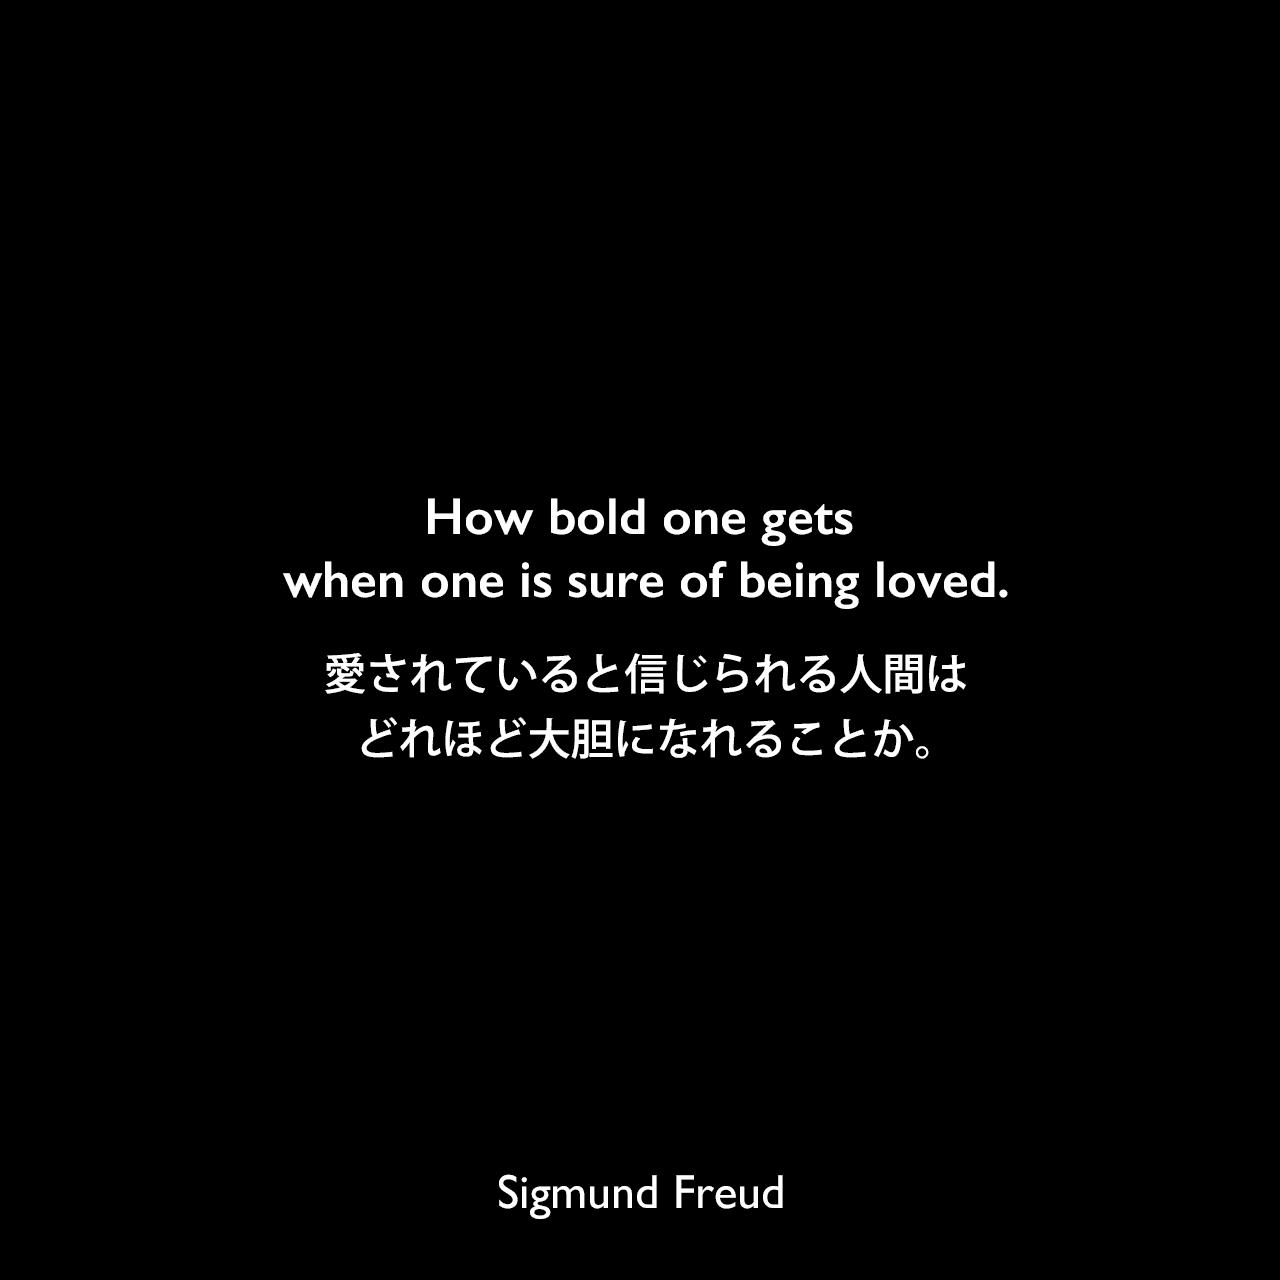 How bold one gets when one is sure of being loved.愛されていると信じられる人間はどれほど大胆になれることか。- フロイトの妻マルタ・ベルナイスへ宛てた手紙よりSigmund Freud